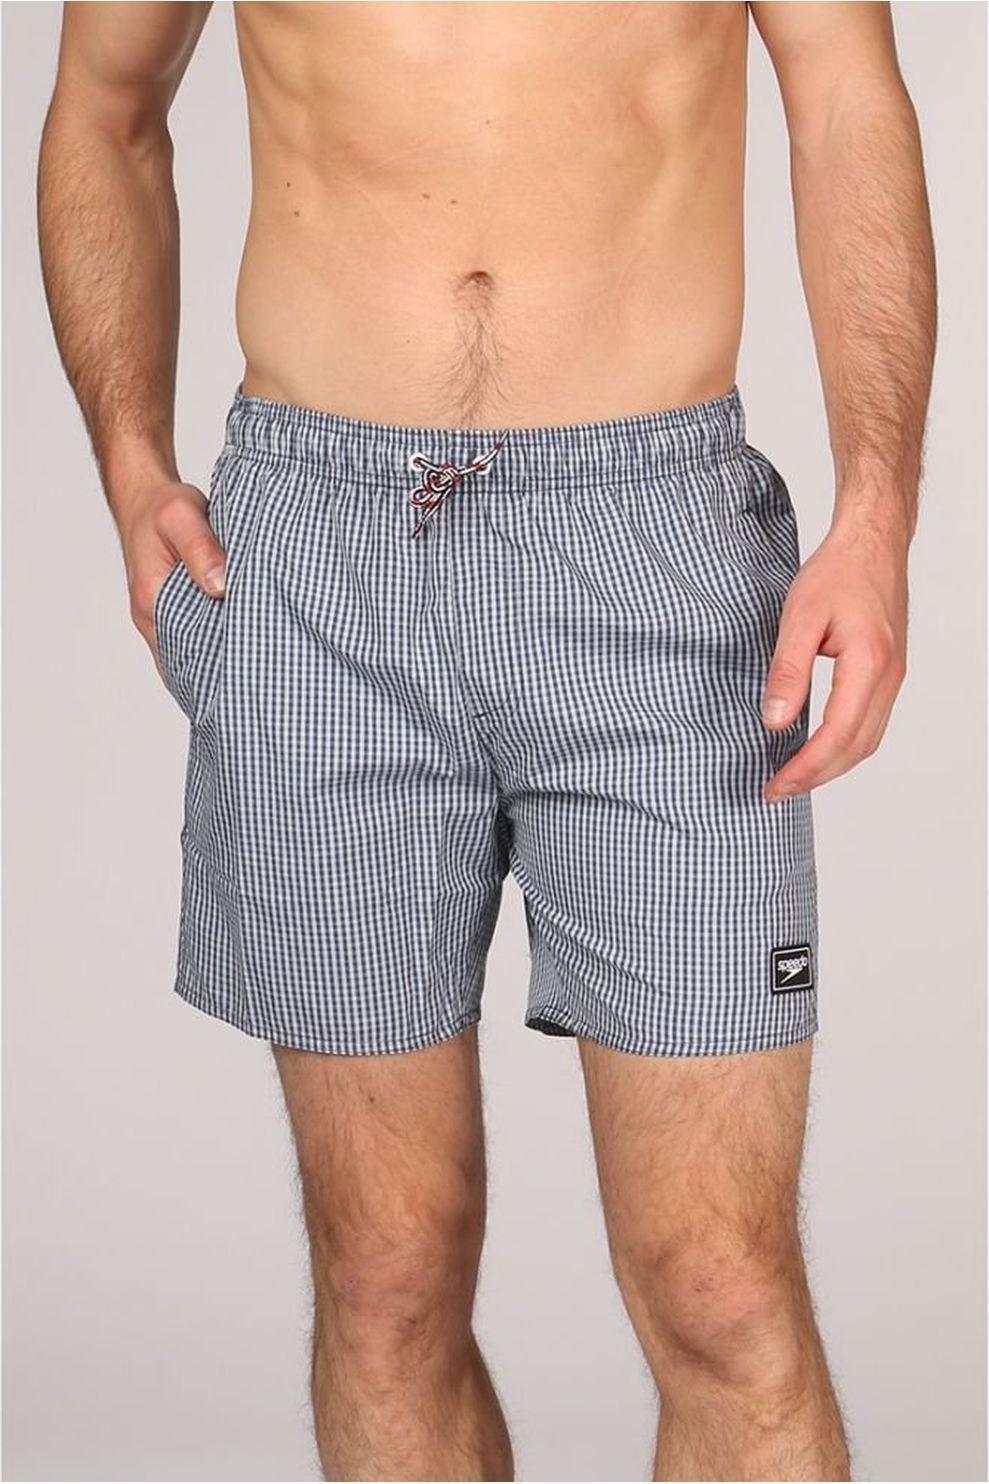 Speedo Zwemshort Stripe Leisure voor heren - Blauw/Wit - Maten: S, XL